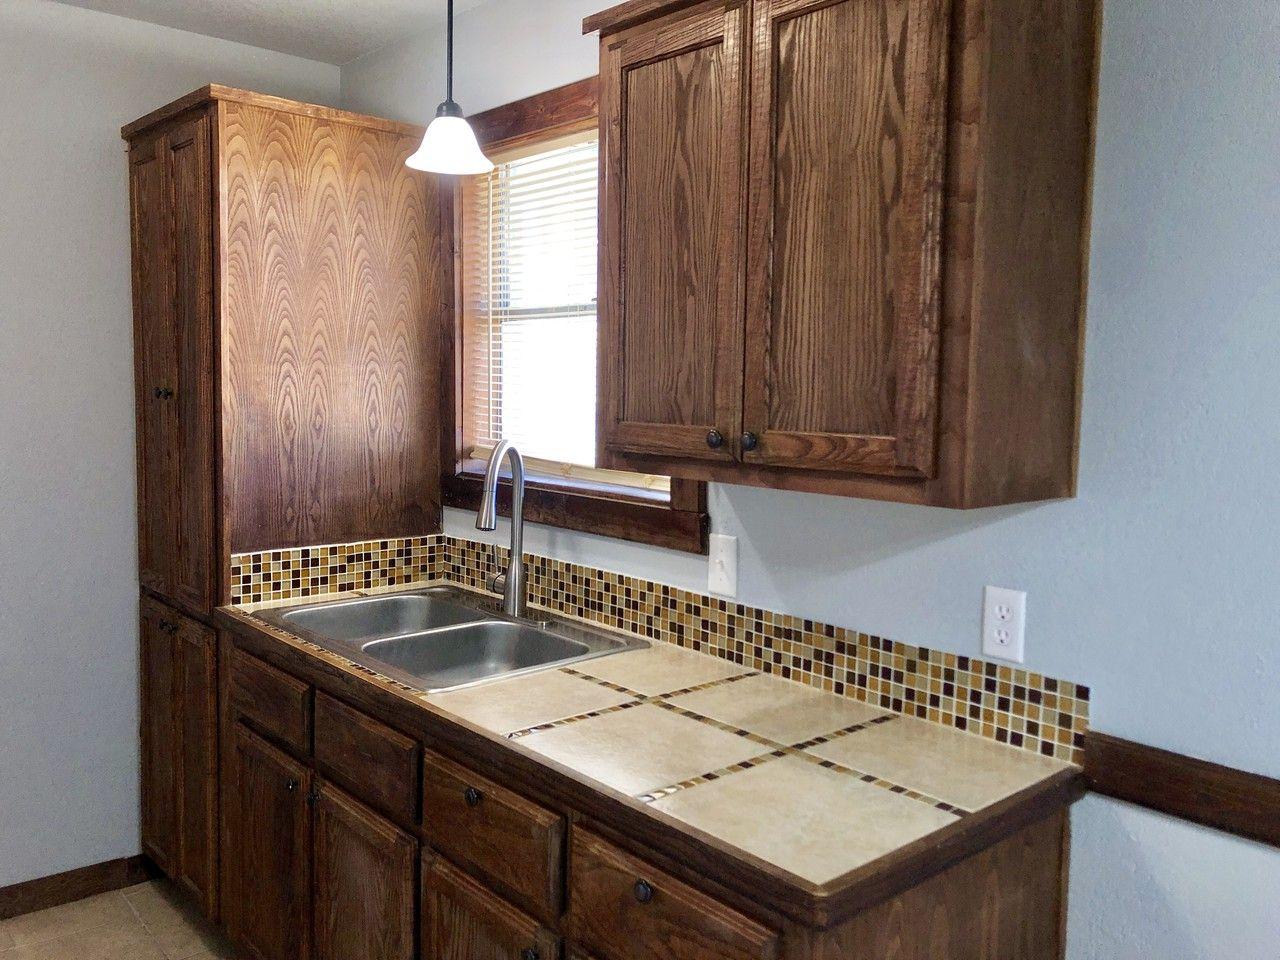 2428 Upas Avenue 10 Mcallen Tx 78501 1 Bedroom Apartment For Rent For 625 Month Zumper